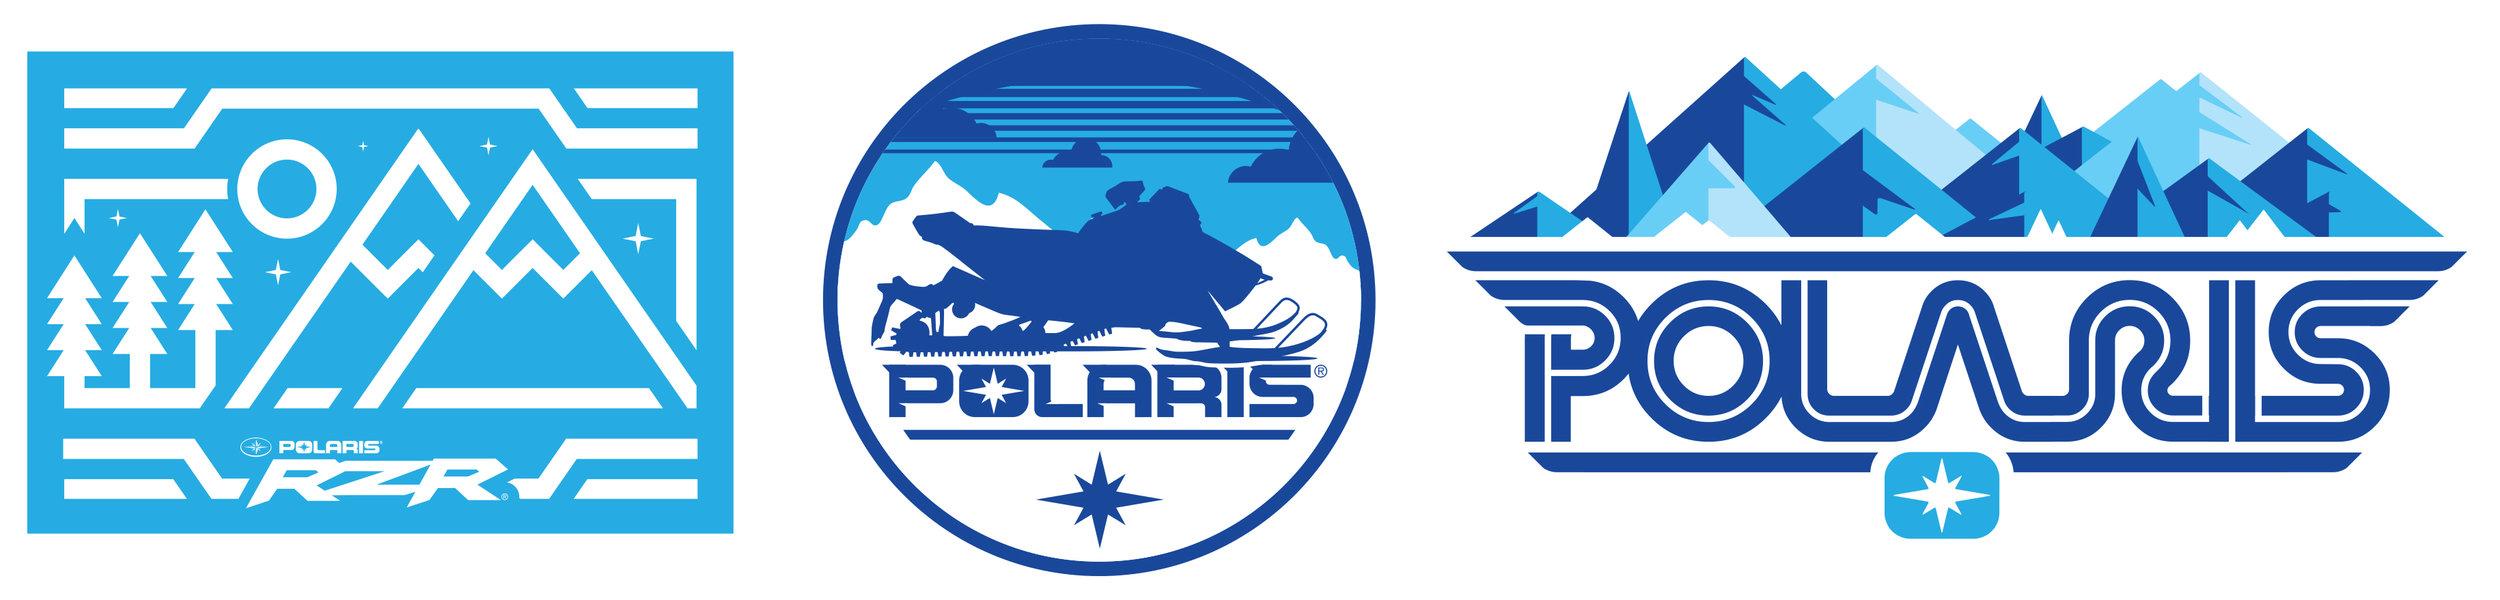 polaris8.jpg